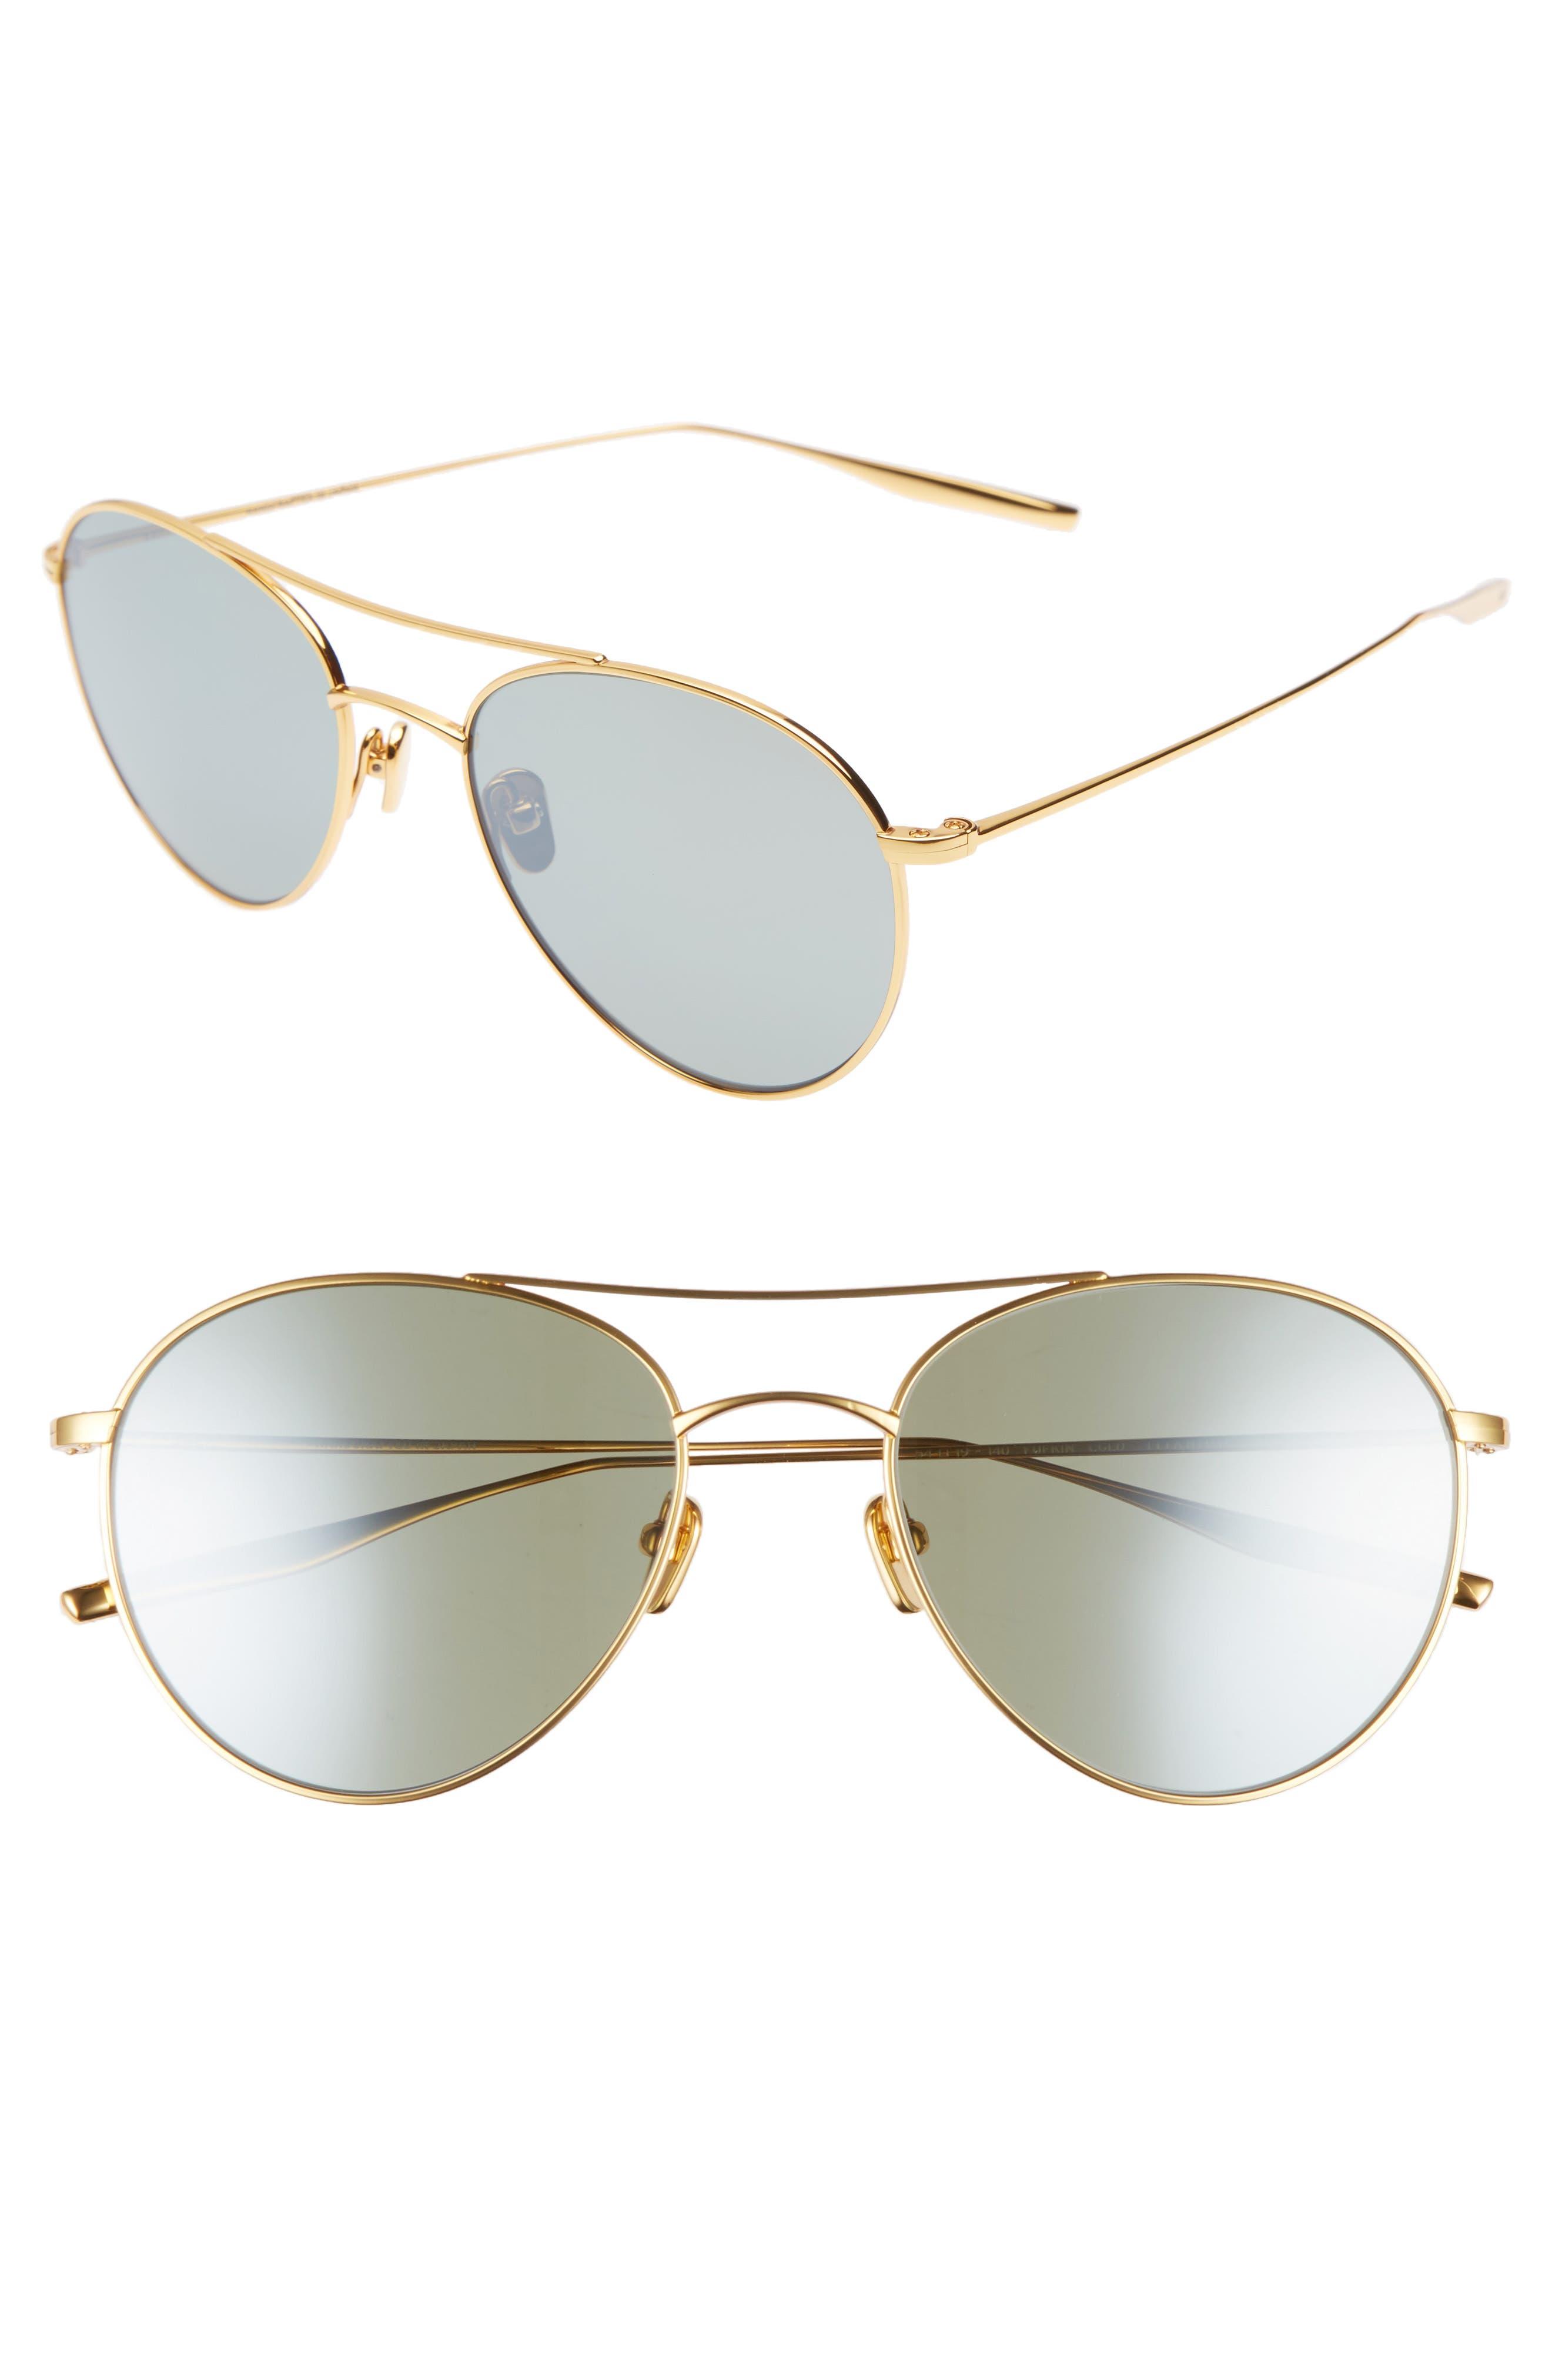 Alternate Image 1 Selected - Salt 54mm Polarized Round Sunglasses